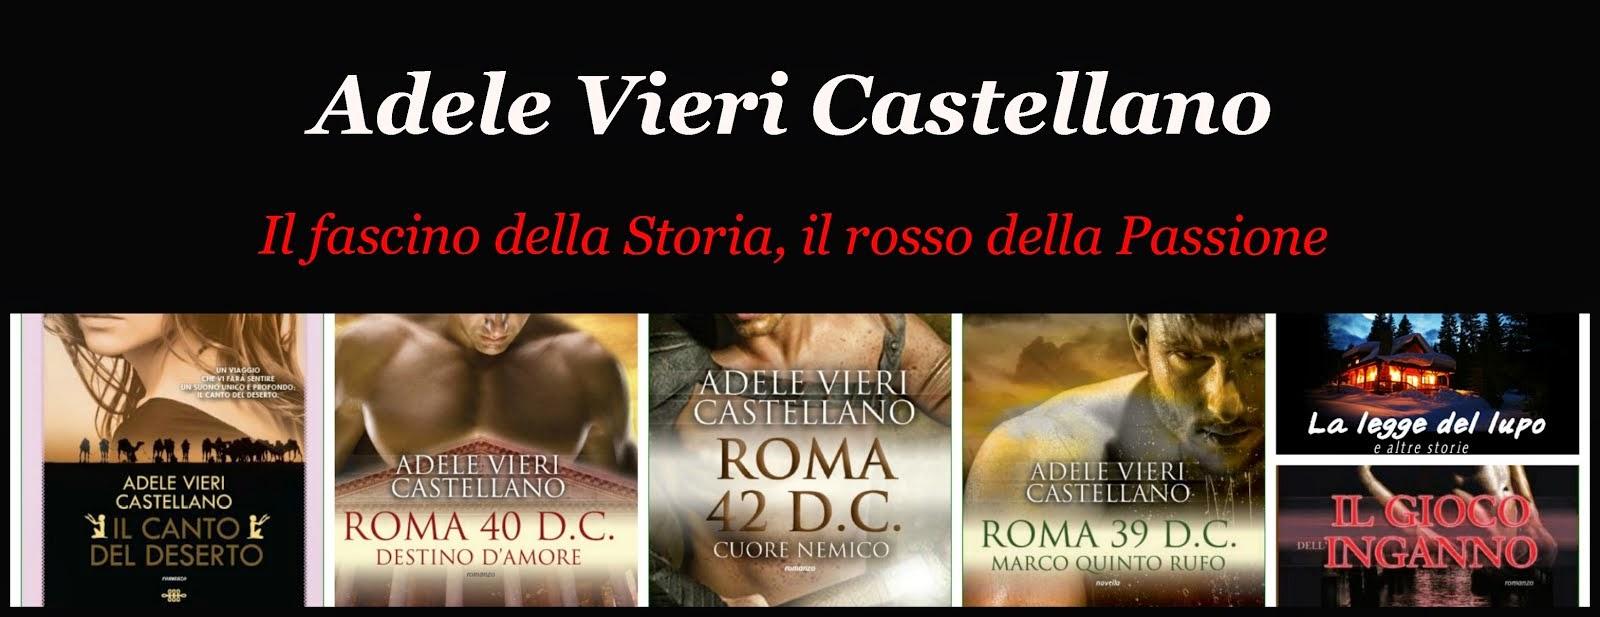 Adele Vieri Castellano